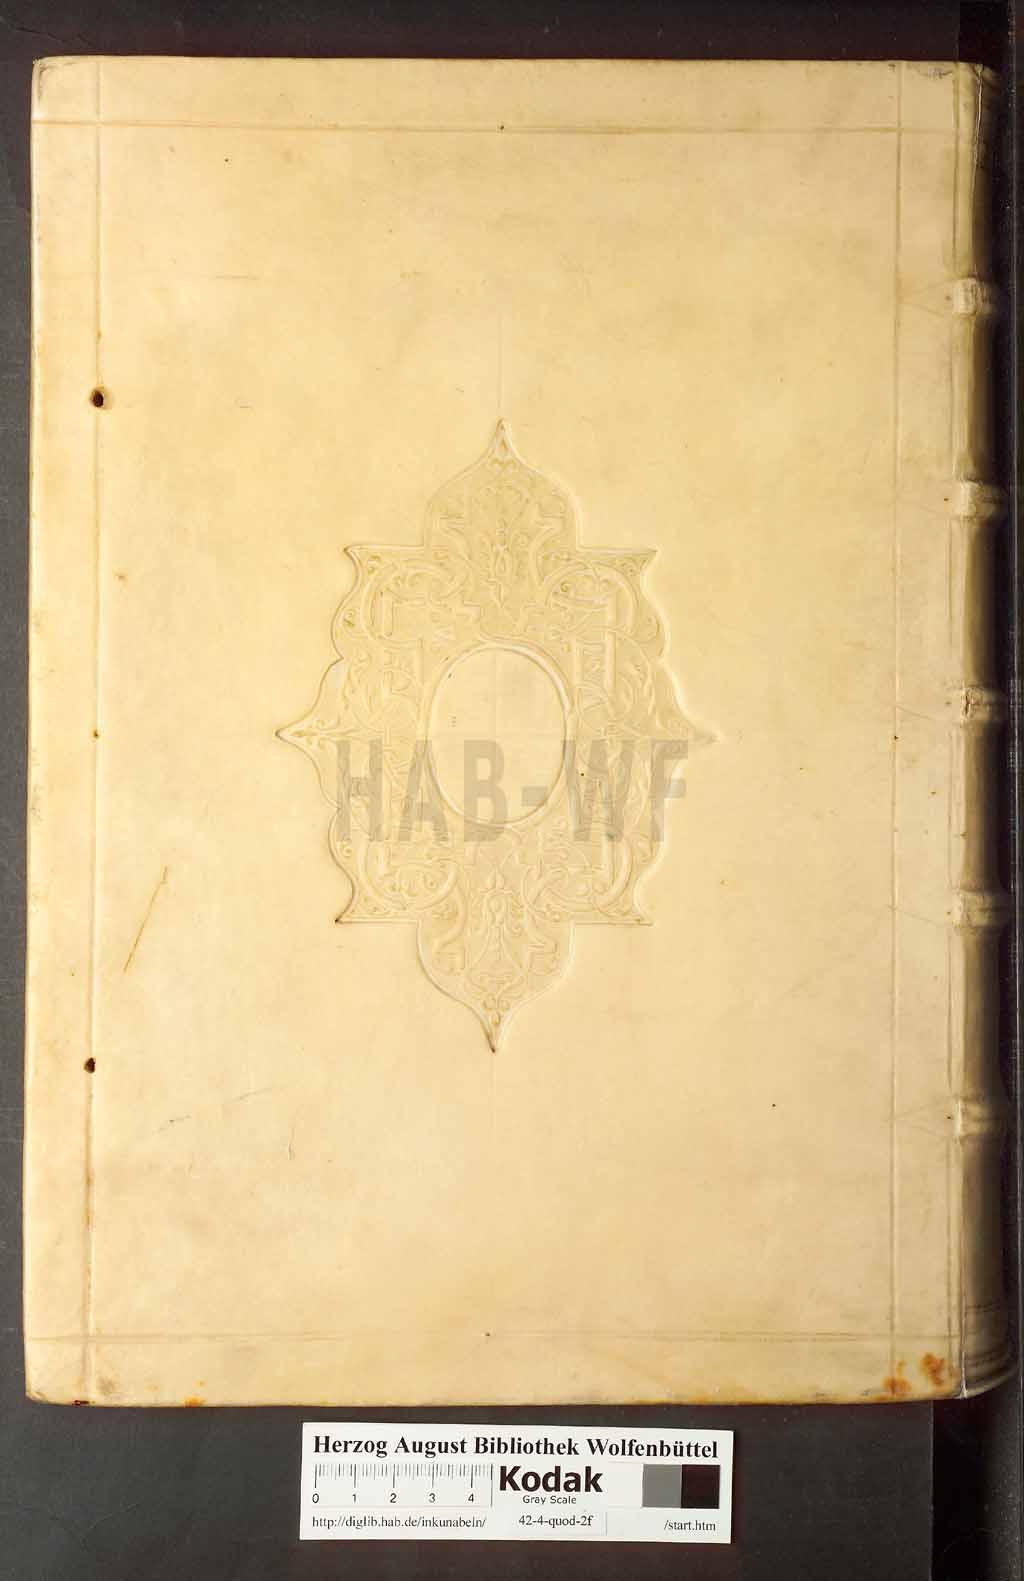 https://diglib.hab.de/inkunabeln/42-4-quod-2f-1/eb04.jpg